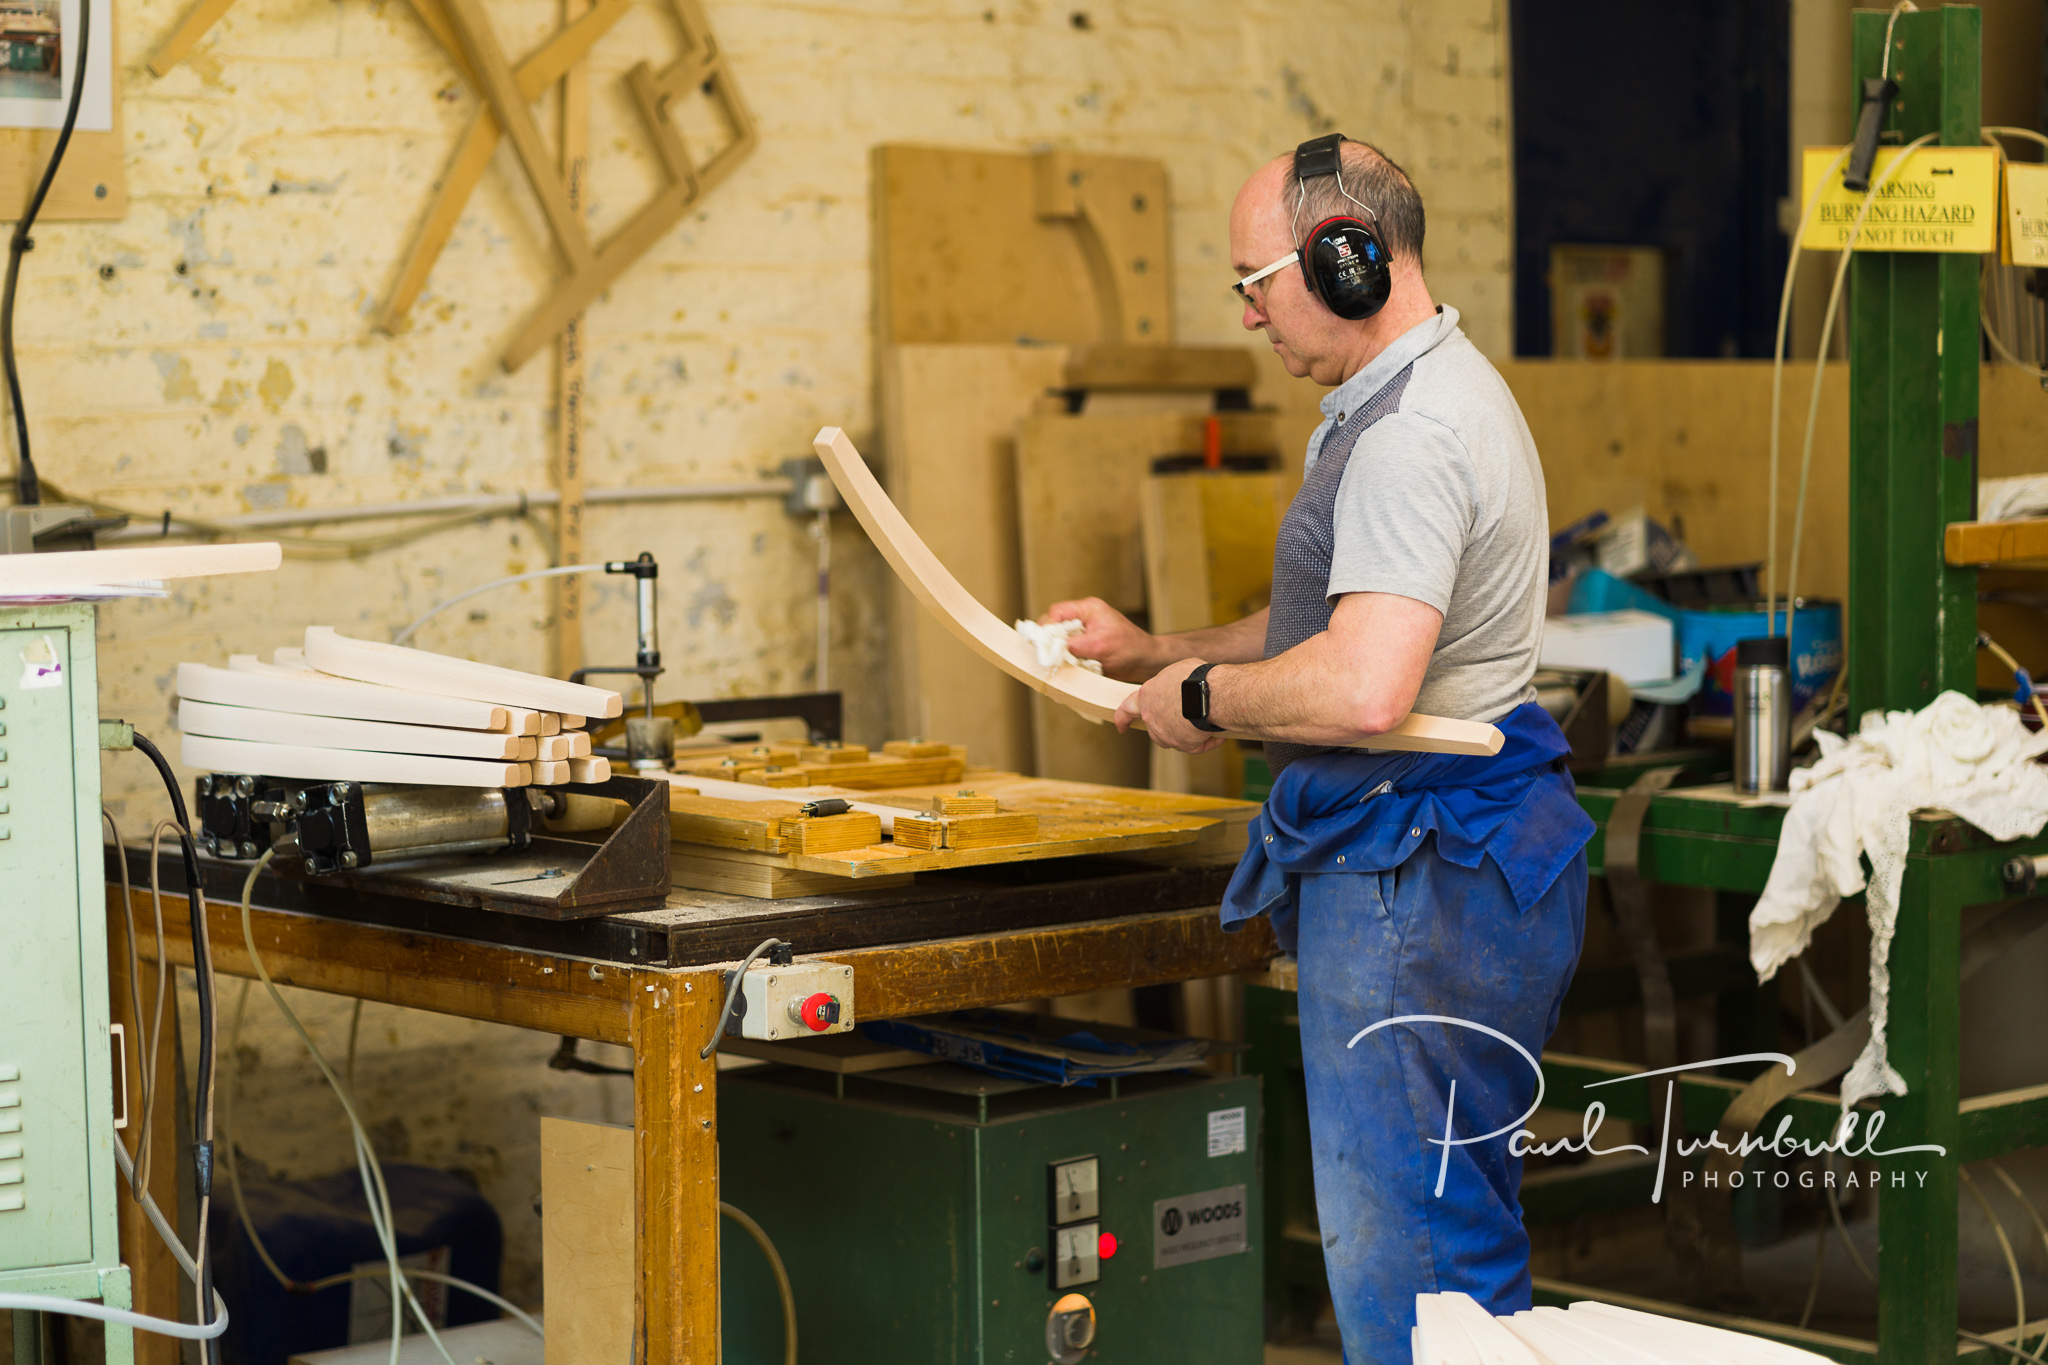 commercial-photographer-leeds-bradford-knightsbridge-furniture-tour-021.jpg